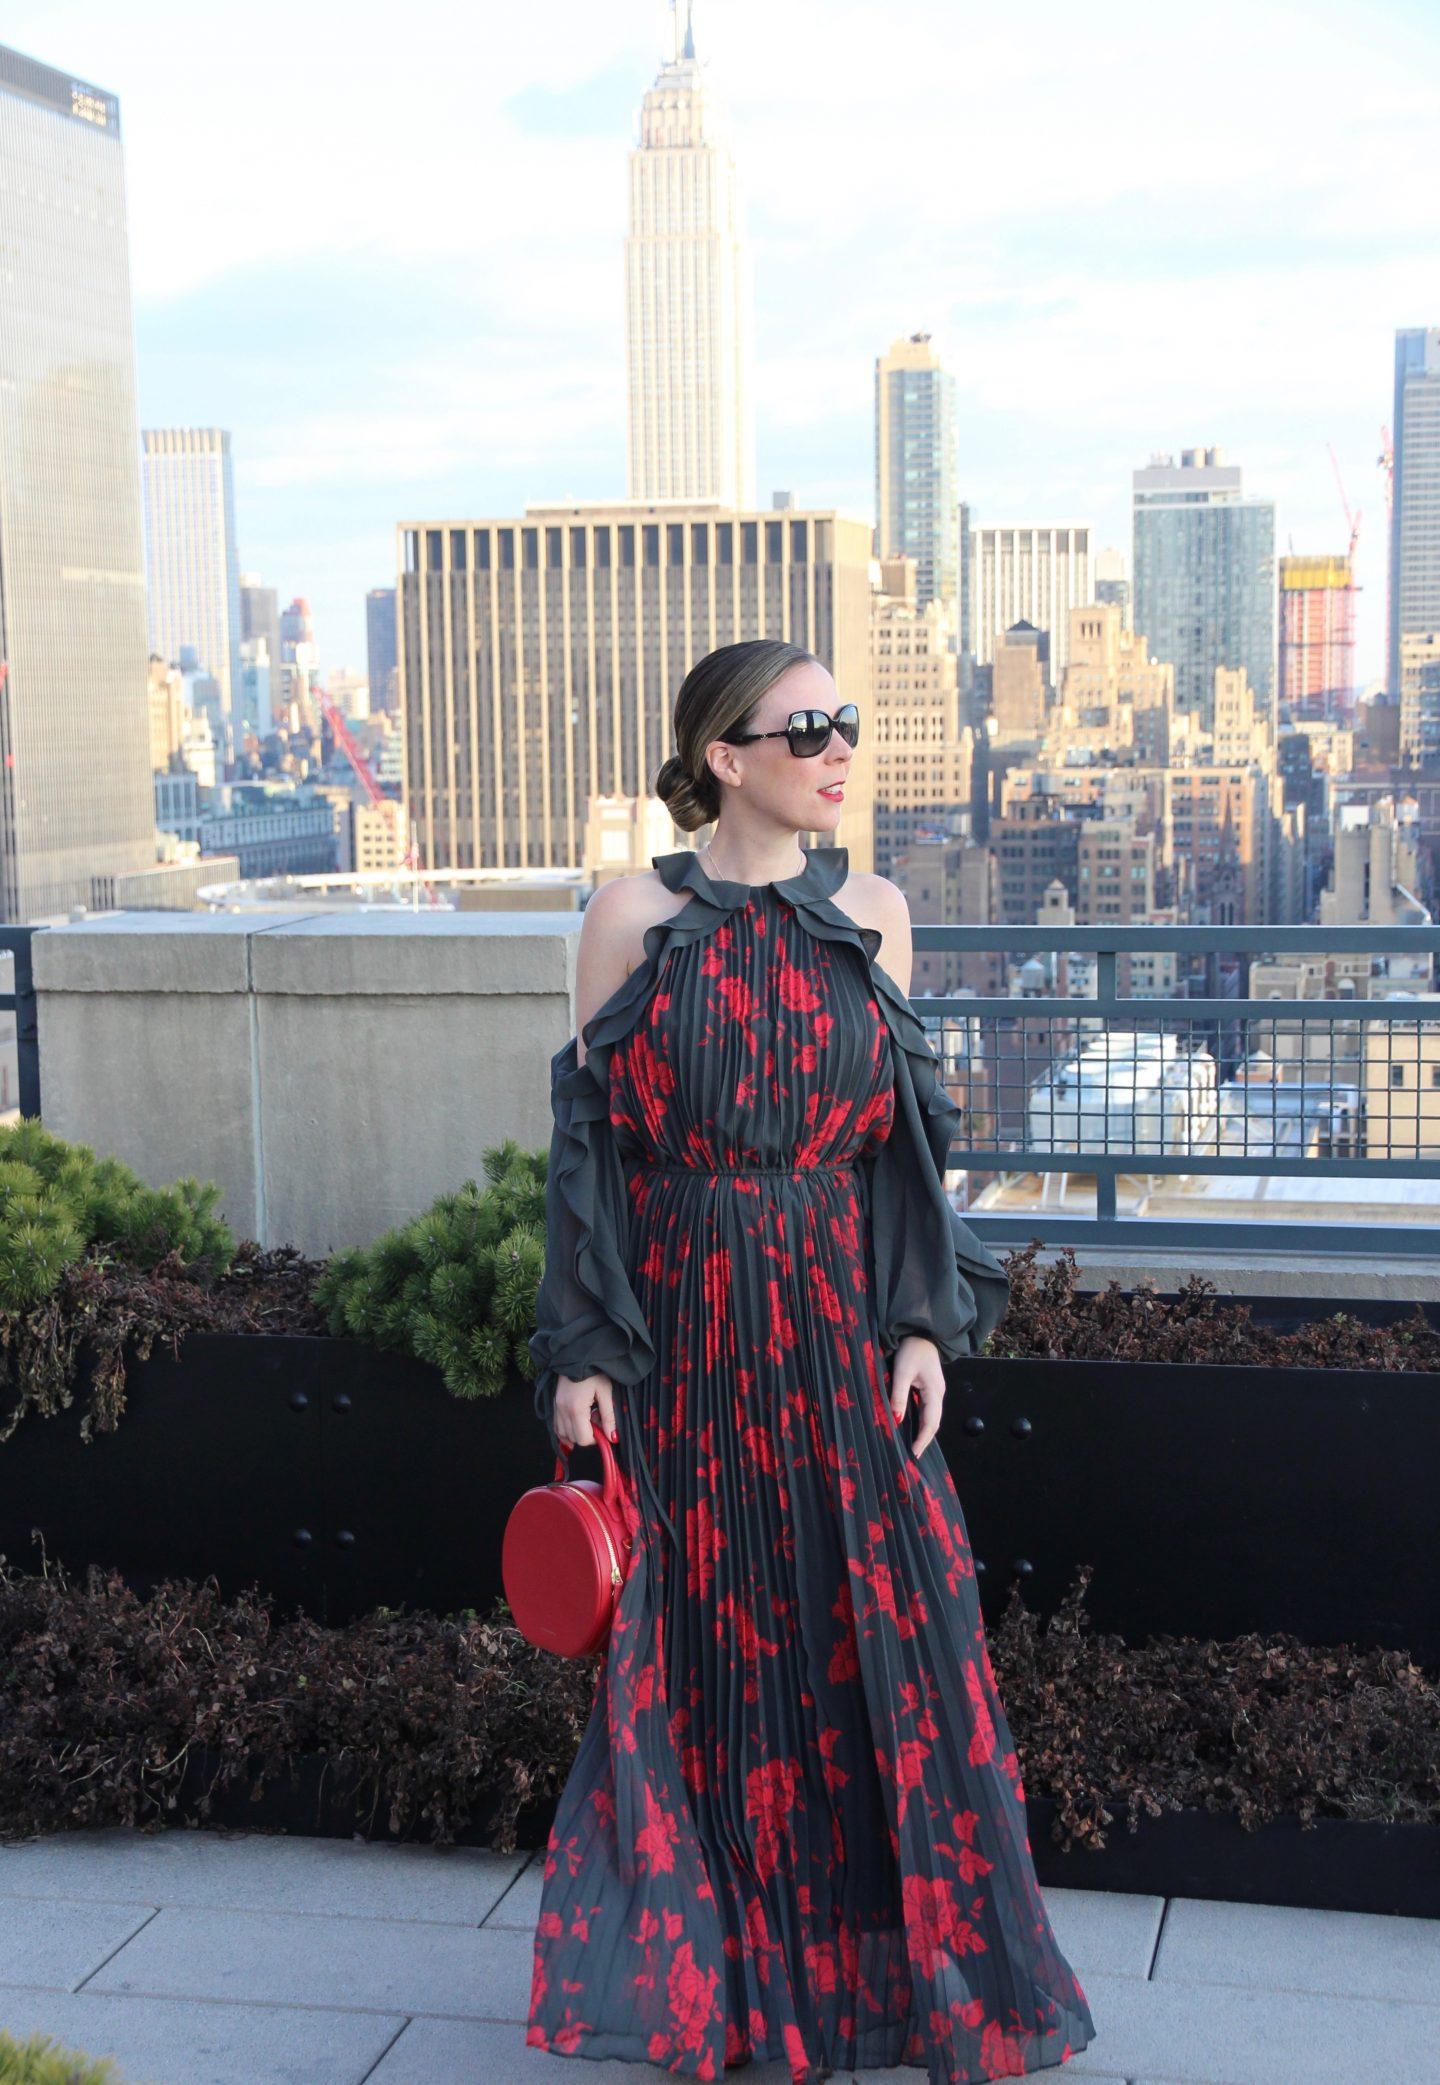 New York City Woman New Years Eve